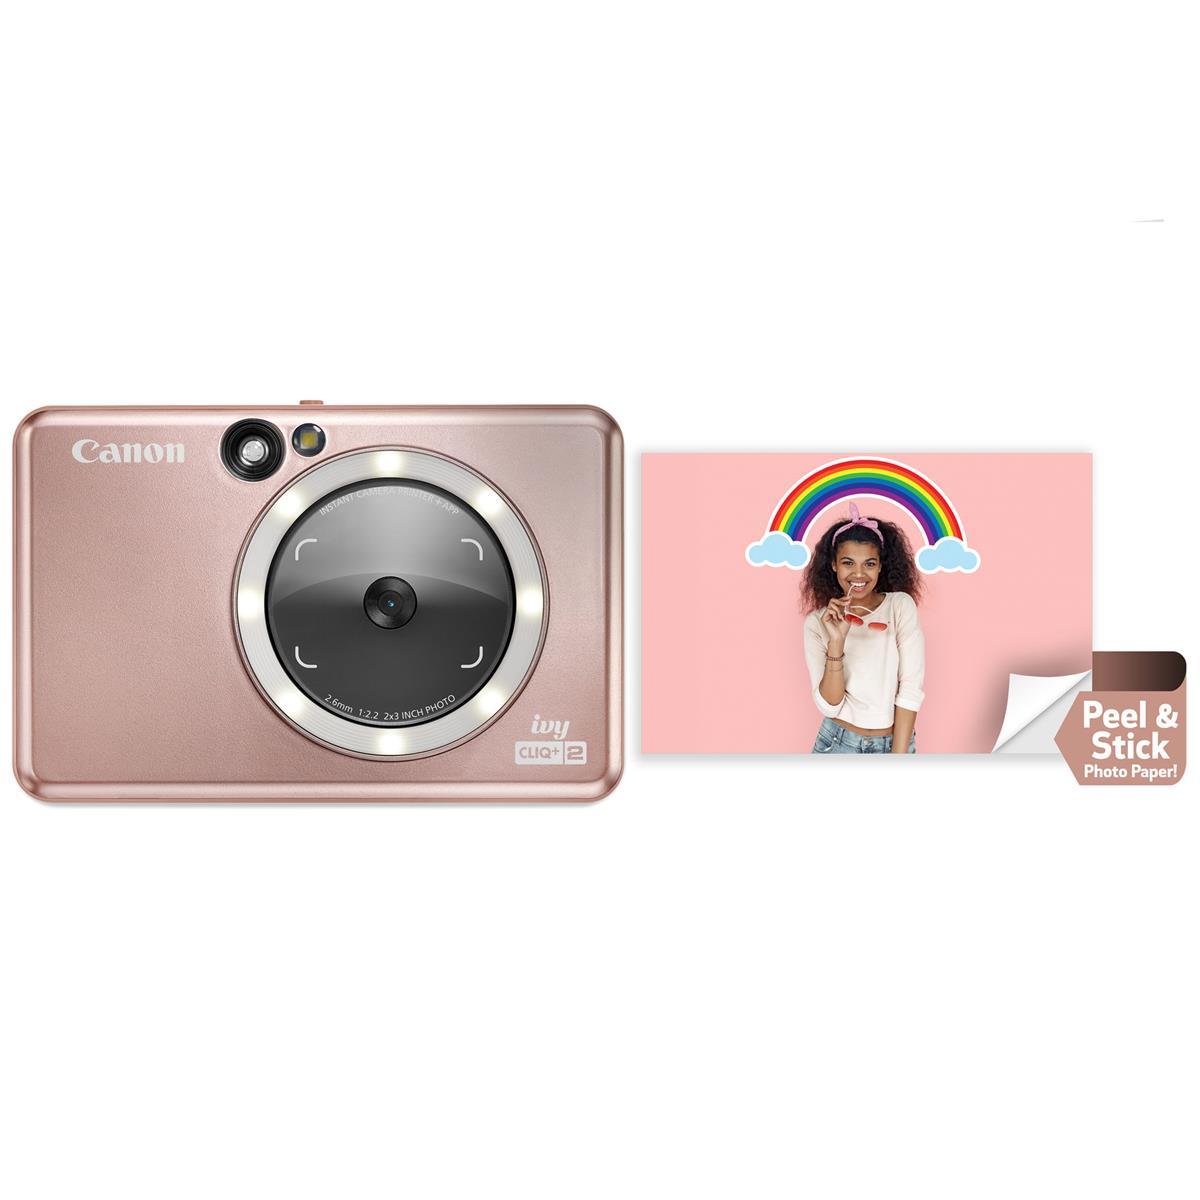 Canon - Ivy Cliq + 2 Instant Film Camera - Rose Gold